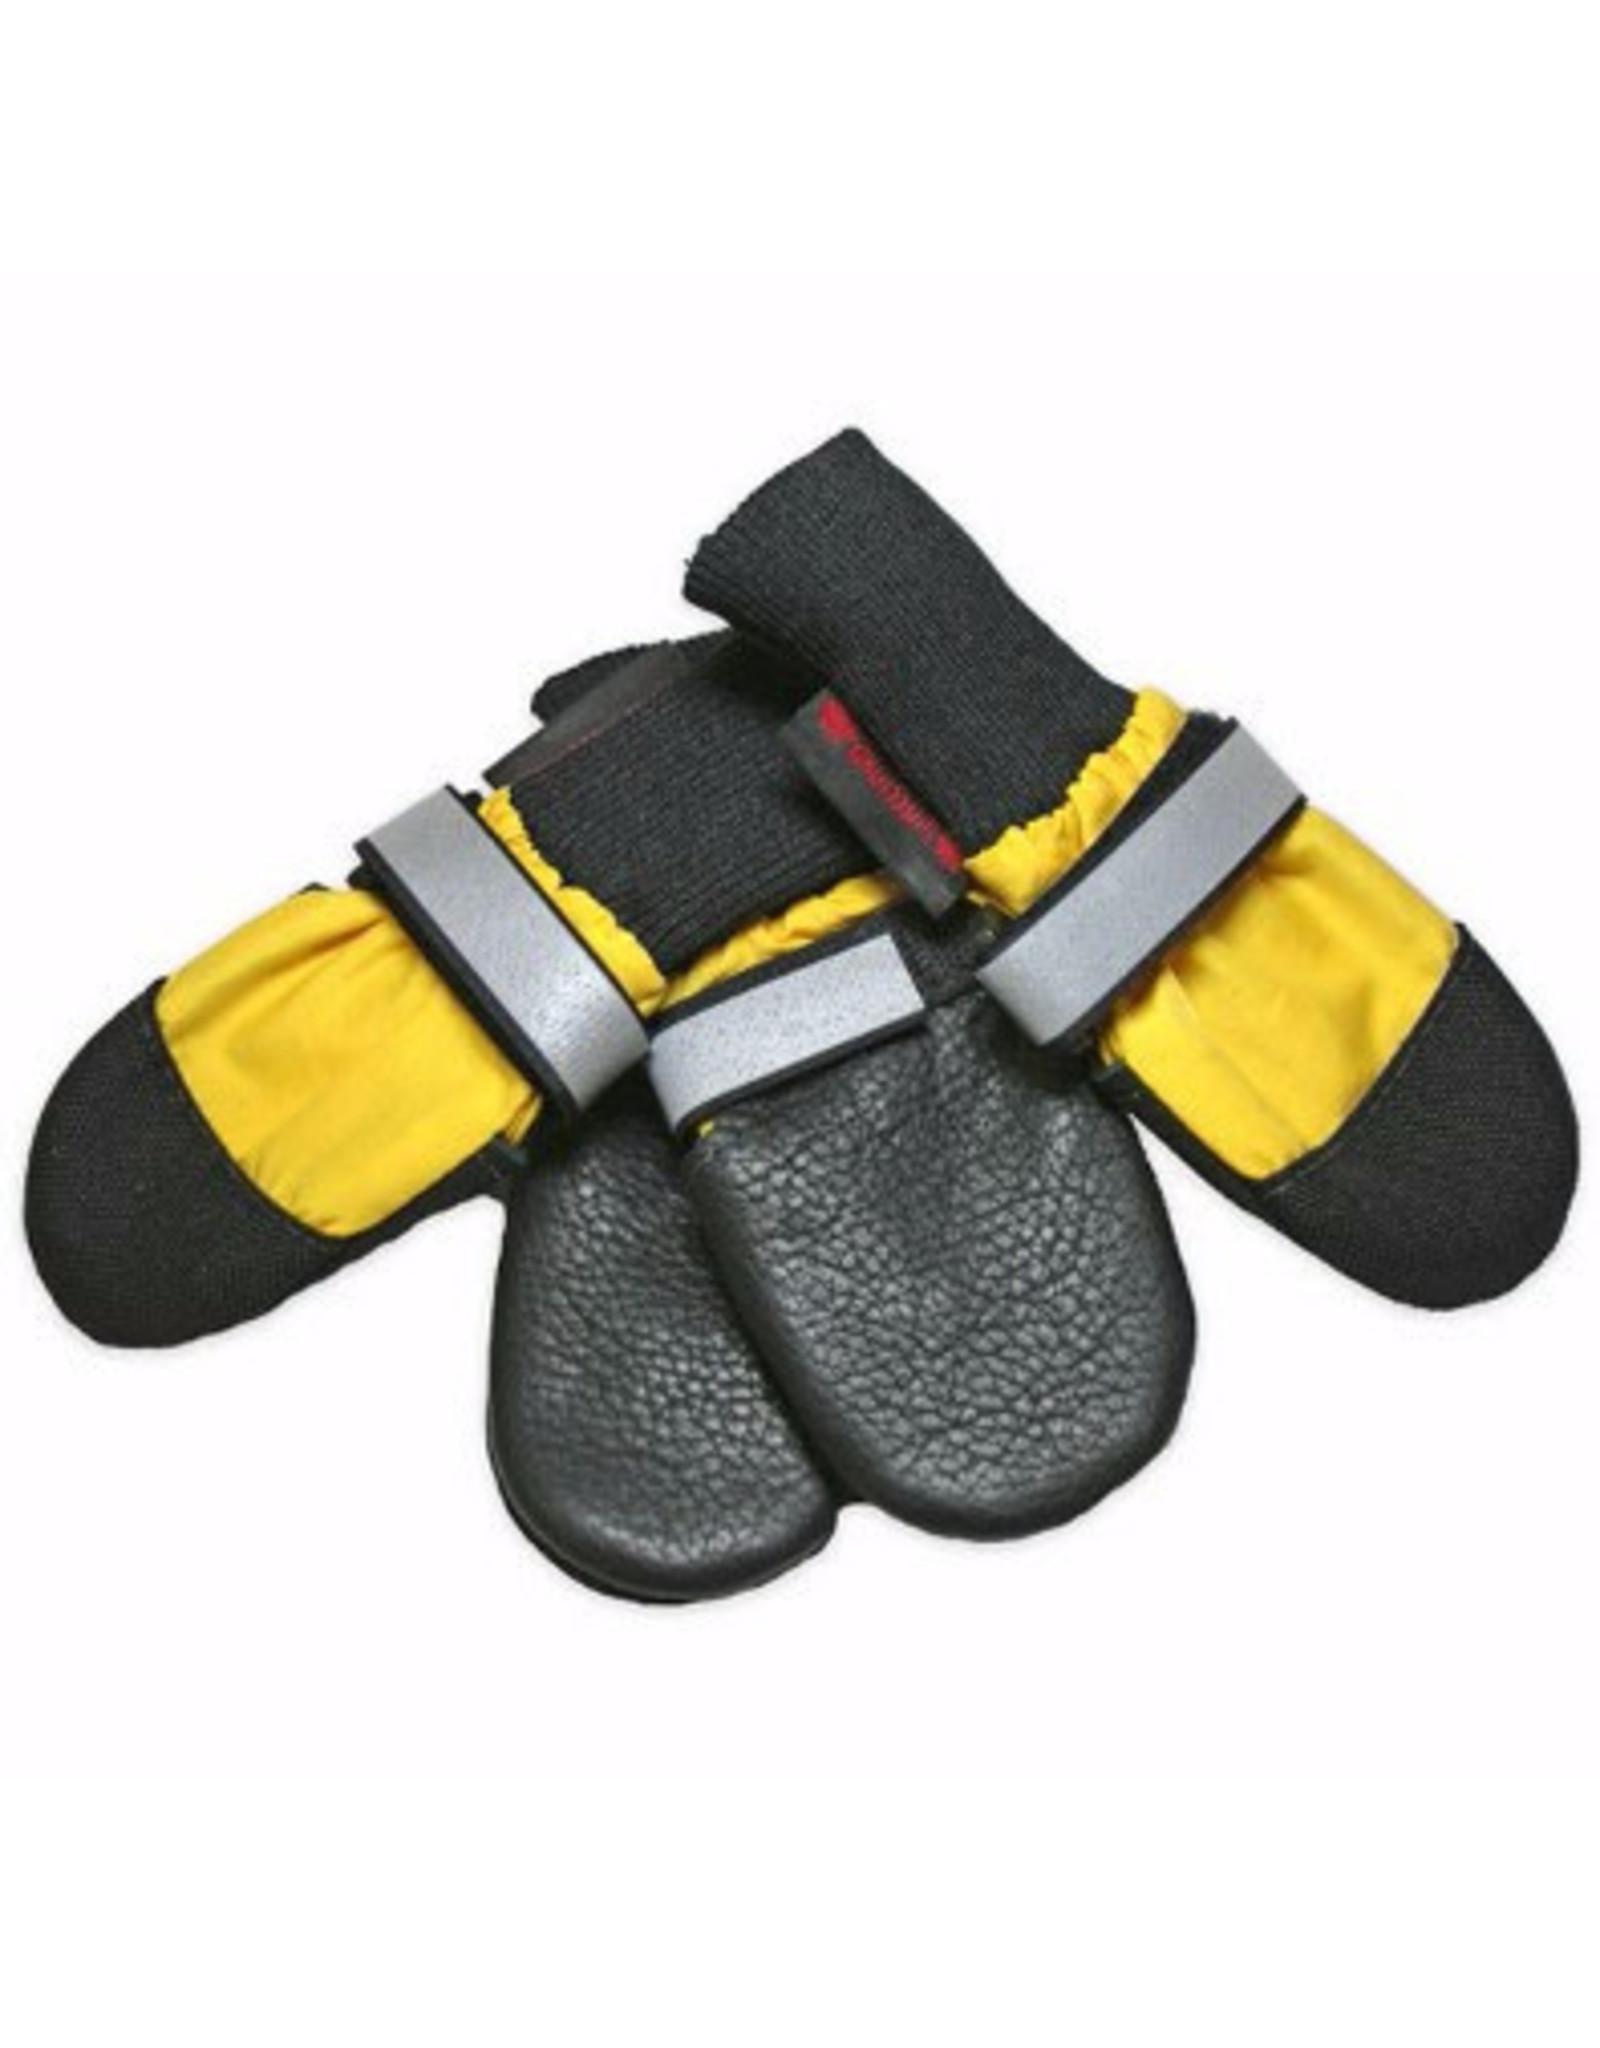 Muttluks Muttluks All-Weather Boots - Yellow S